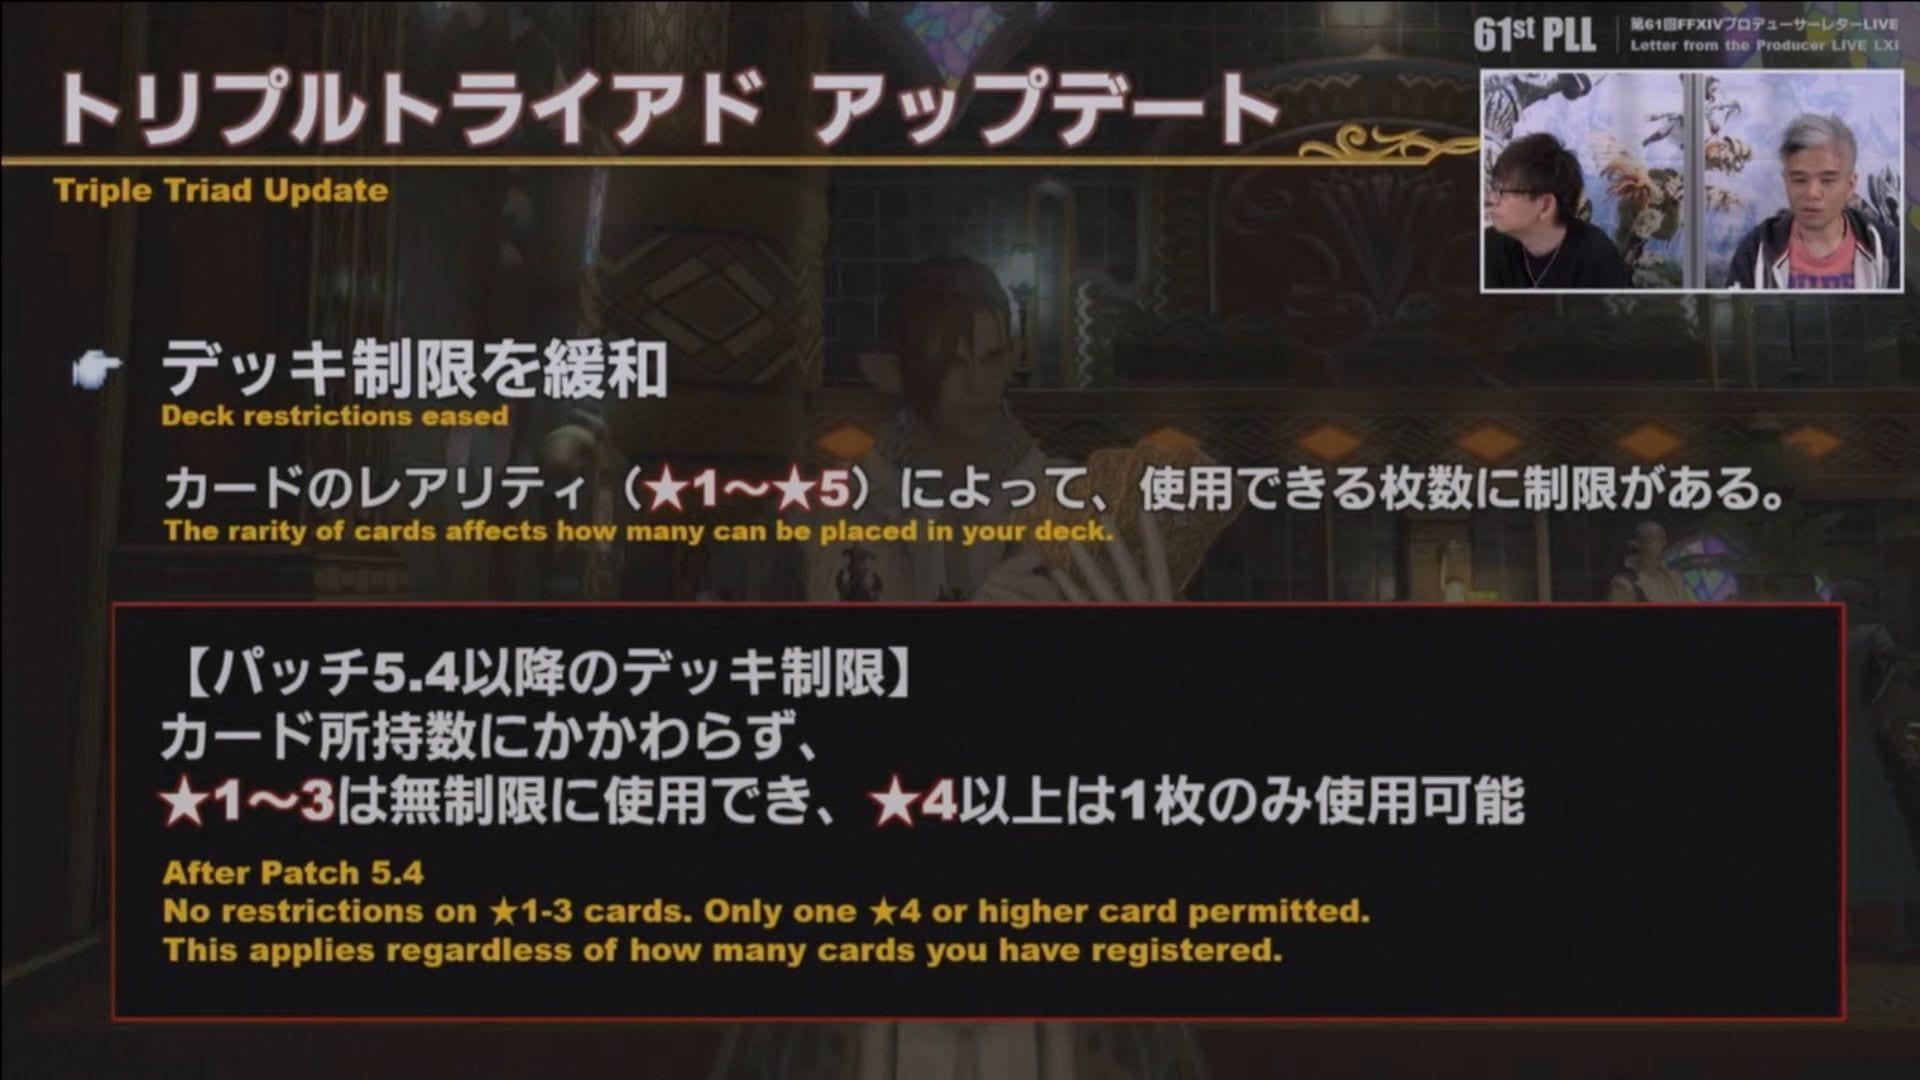 Final-Fantasy-XIV-Screenshot-2020-11-27-13-59-38.jpg?ssl=1